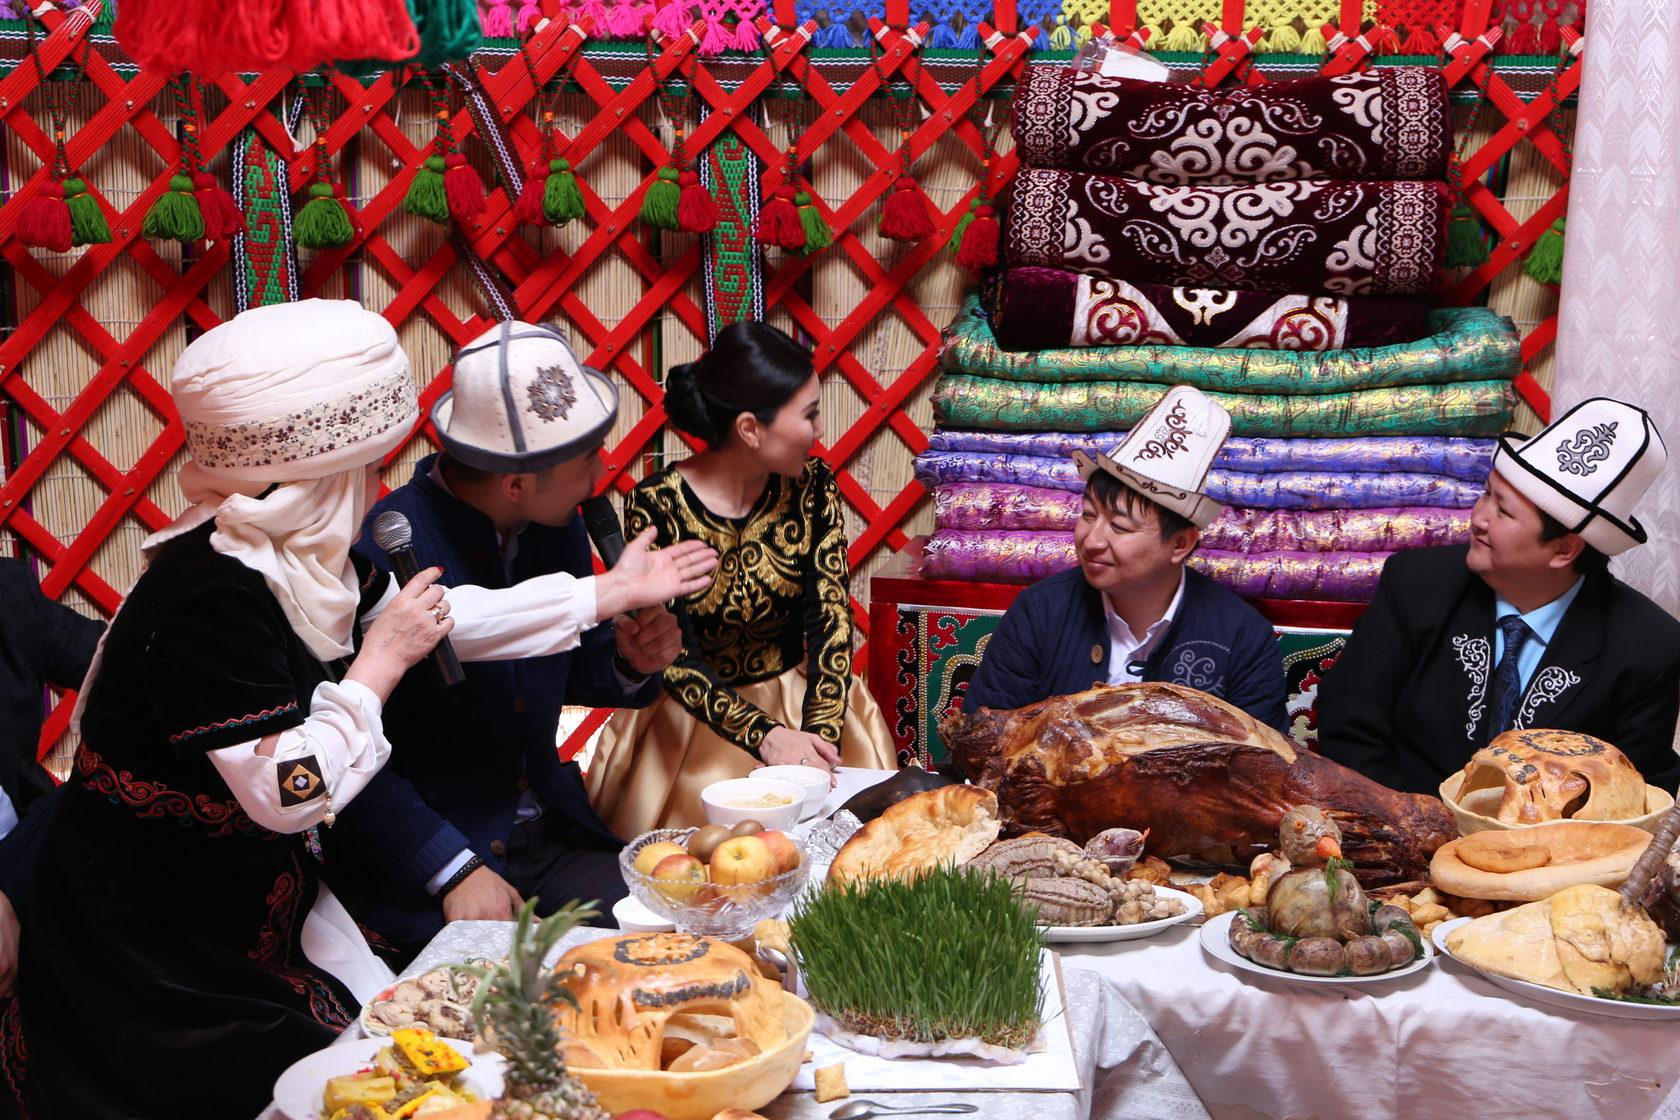 картинки традиции в казахстане